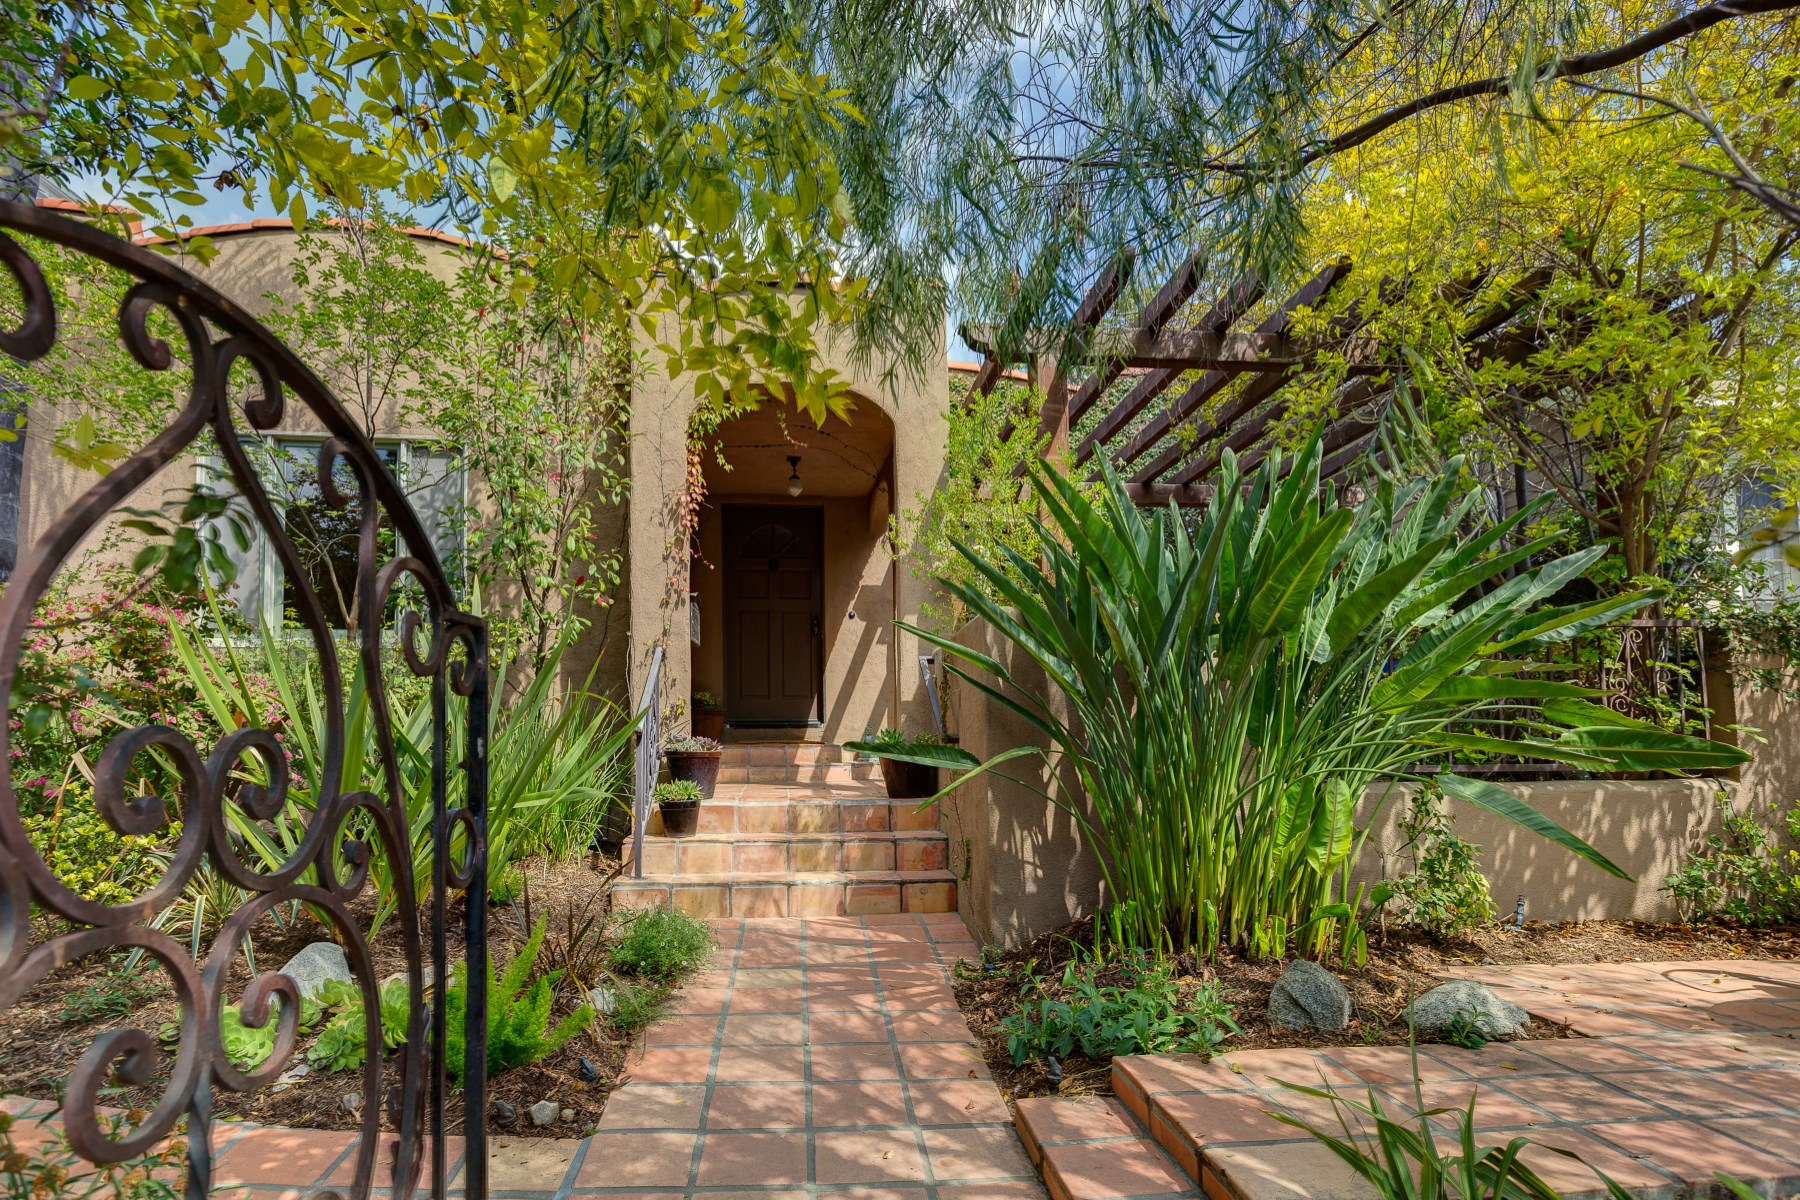 獨棟家庭住宅 為 出售 在 1410 North Benton Way Silver Lake, Los Angeles, 加利福尼亞州, 90026 美國